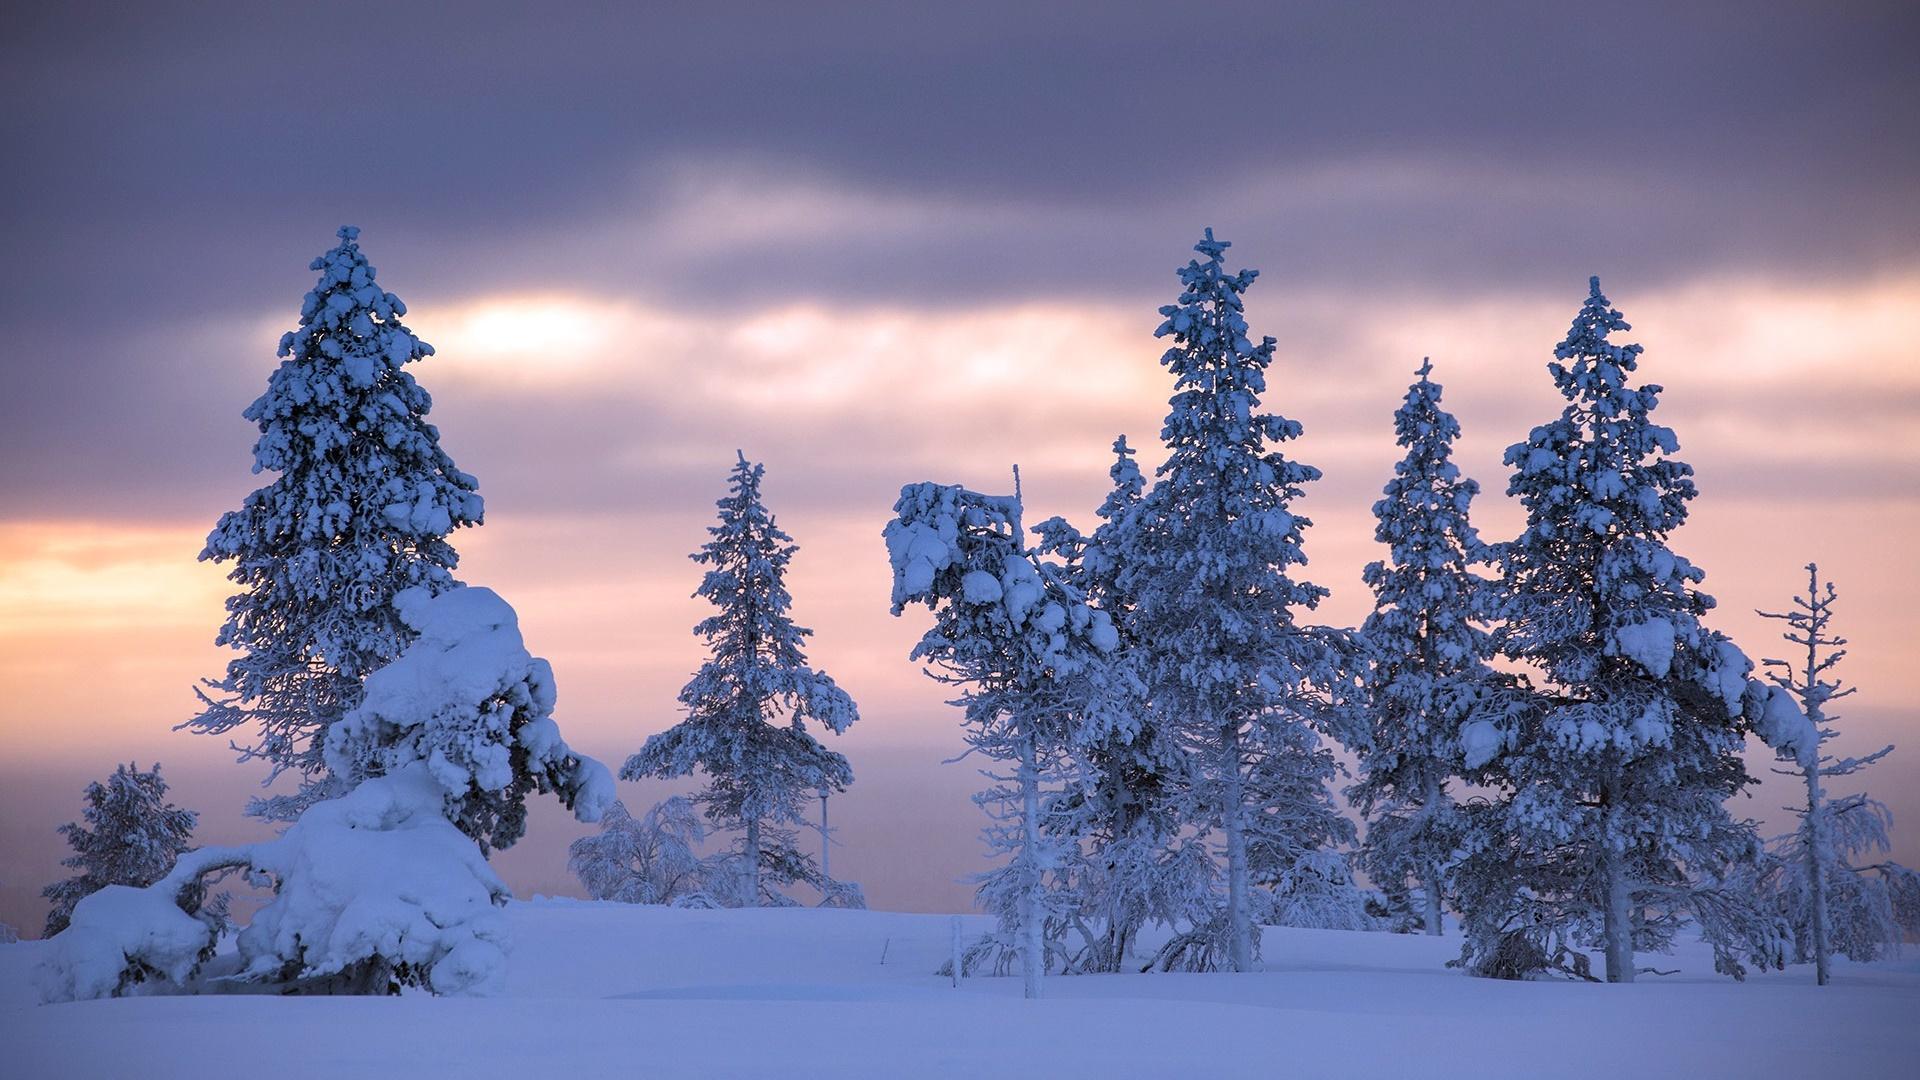 Wallpaper Trees Nature Landscape Snow Winter 1920x1080